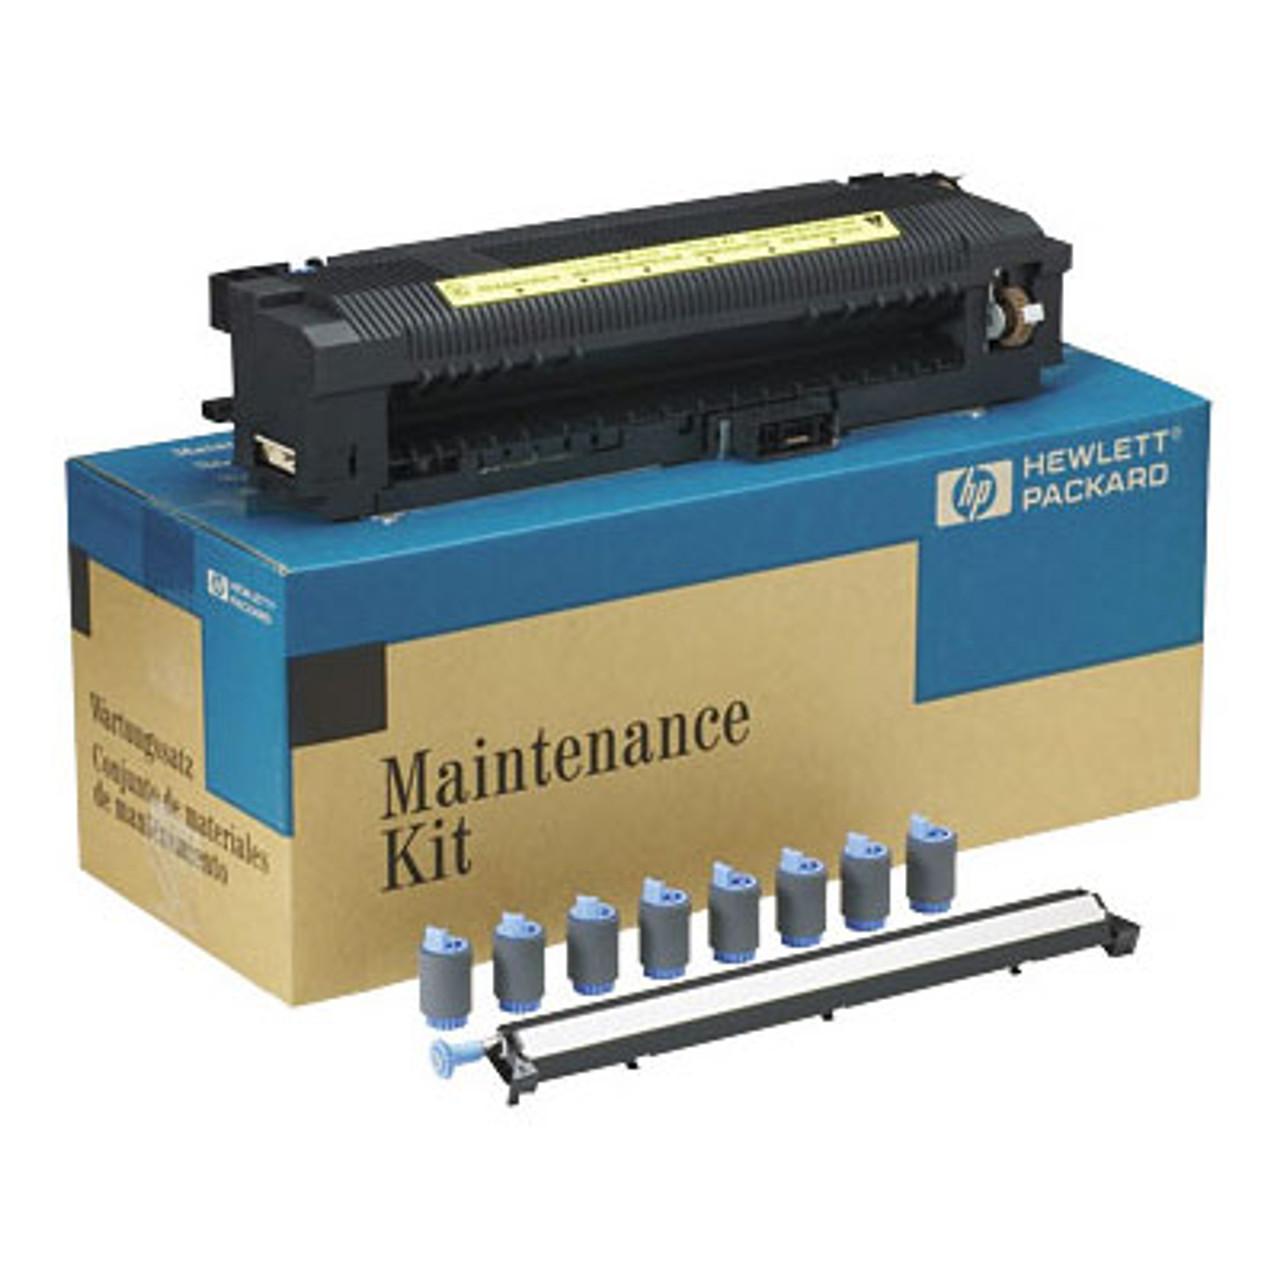 HP 8000 Maintenance Kit  - New